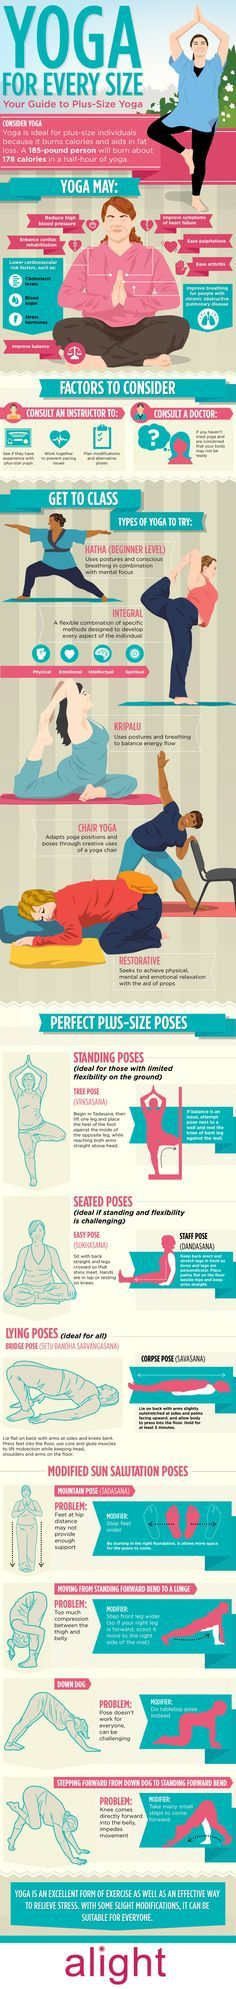 Yoga For Every Size: Yoga For Every Size: Your Guide To Plus-Size Yoga Infographic - www.alight.com/...